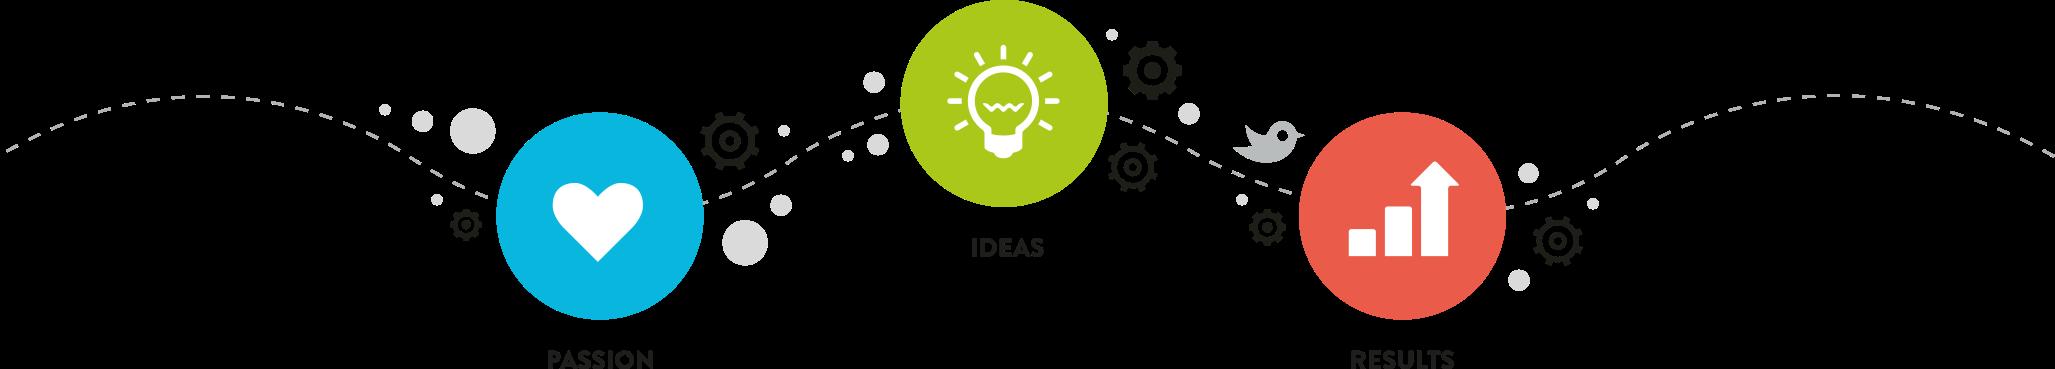 Software Development | Web Design Company